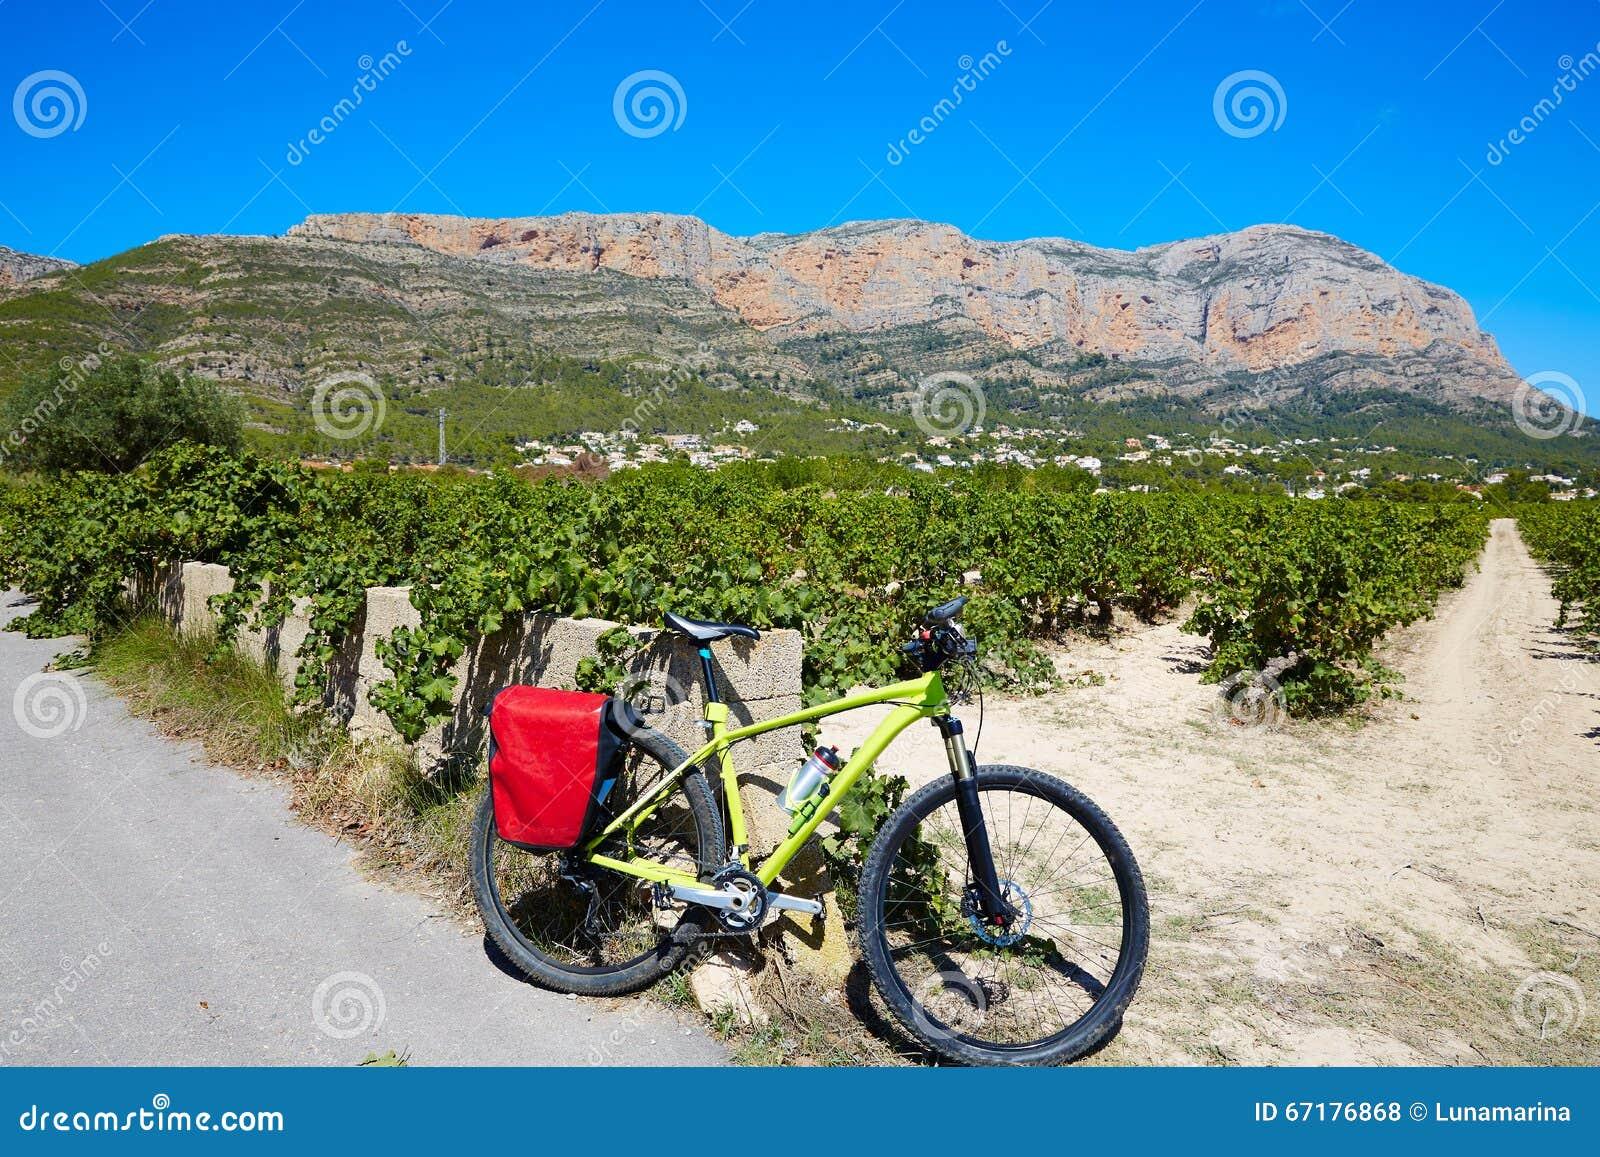 Xabia Javea Montgo vineyards biking MTB